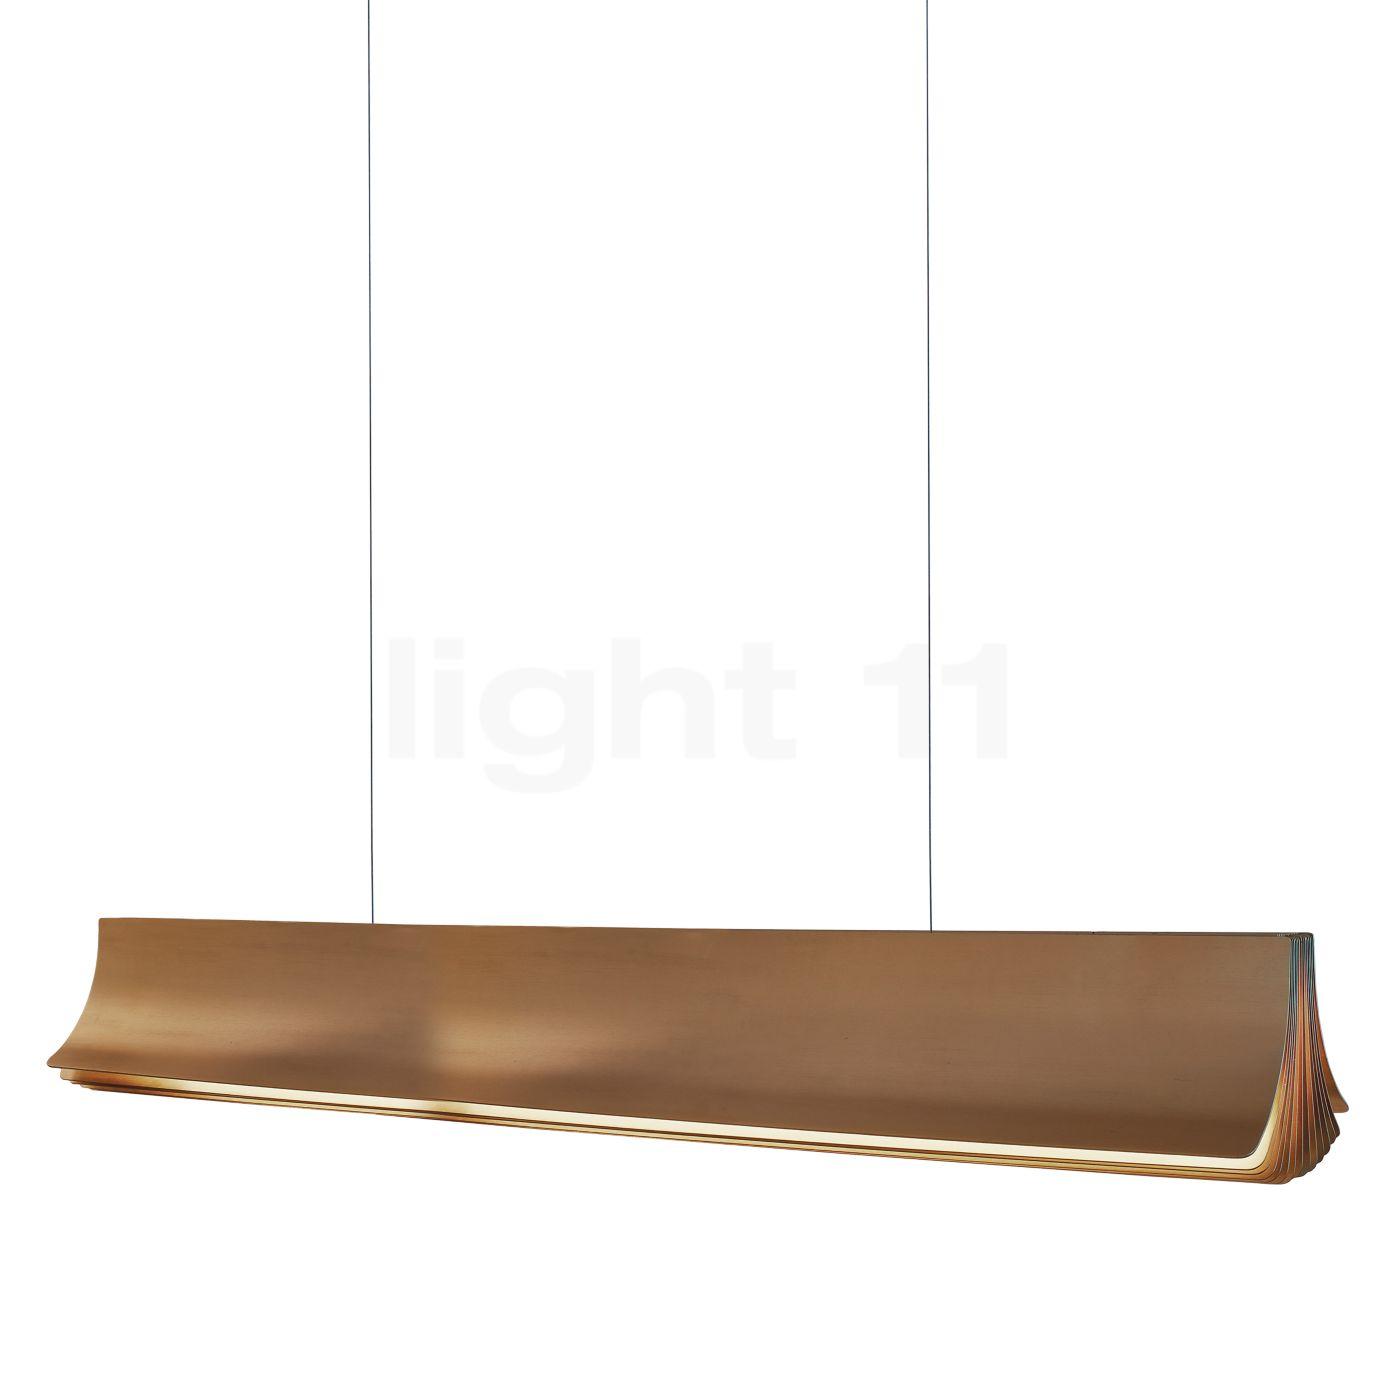 DCW Respiro Pendelleuchte LED, gold, 120 cm , Lagerverkauf, Neuware RESPIRO 1200 GOLD-GOLD